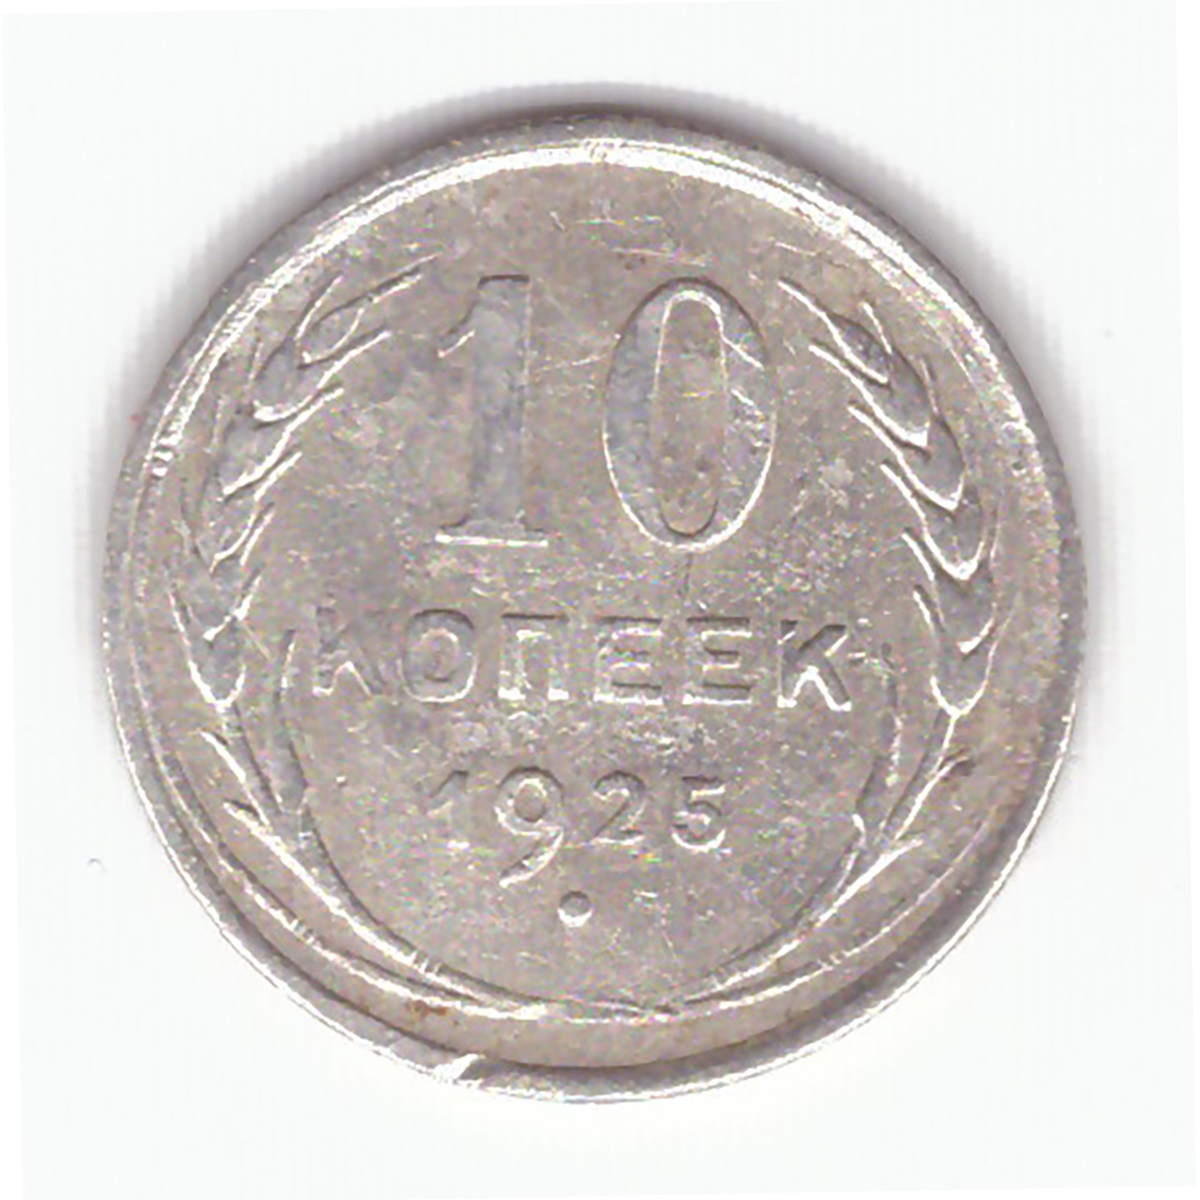 10 копеек 1925 года F №4